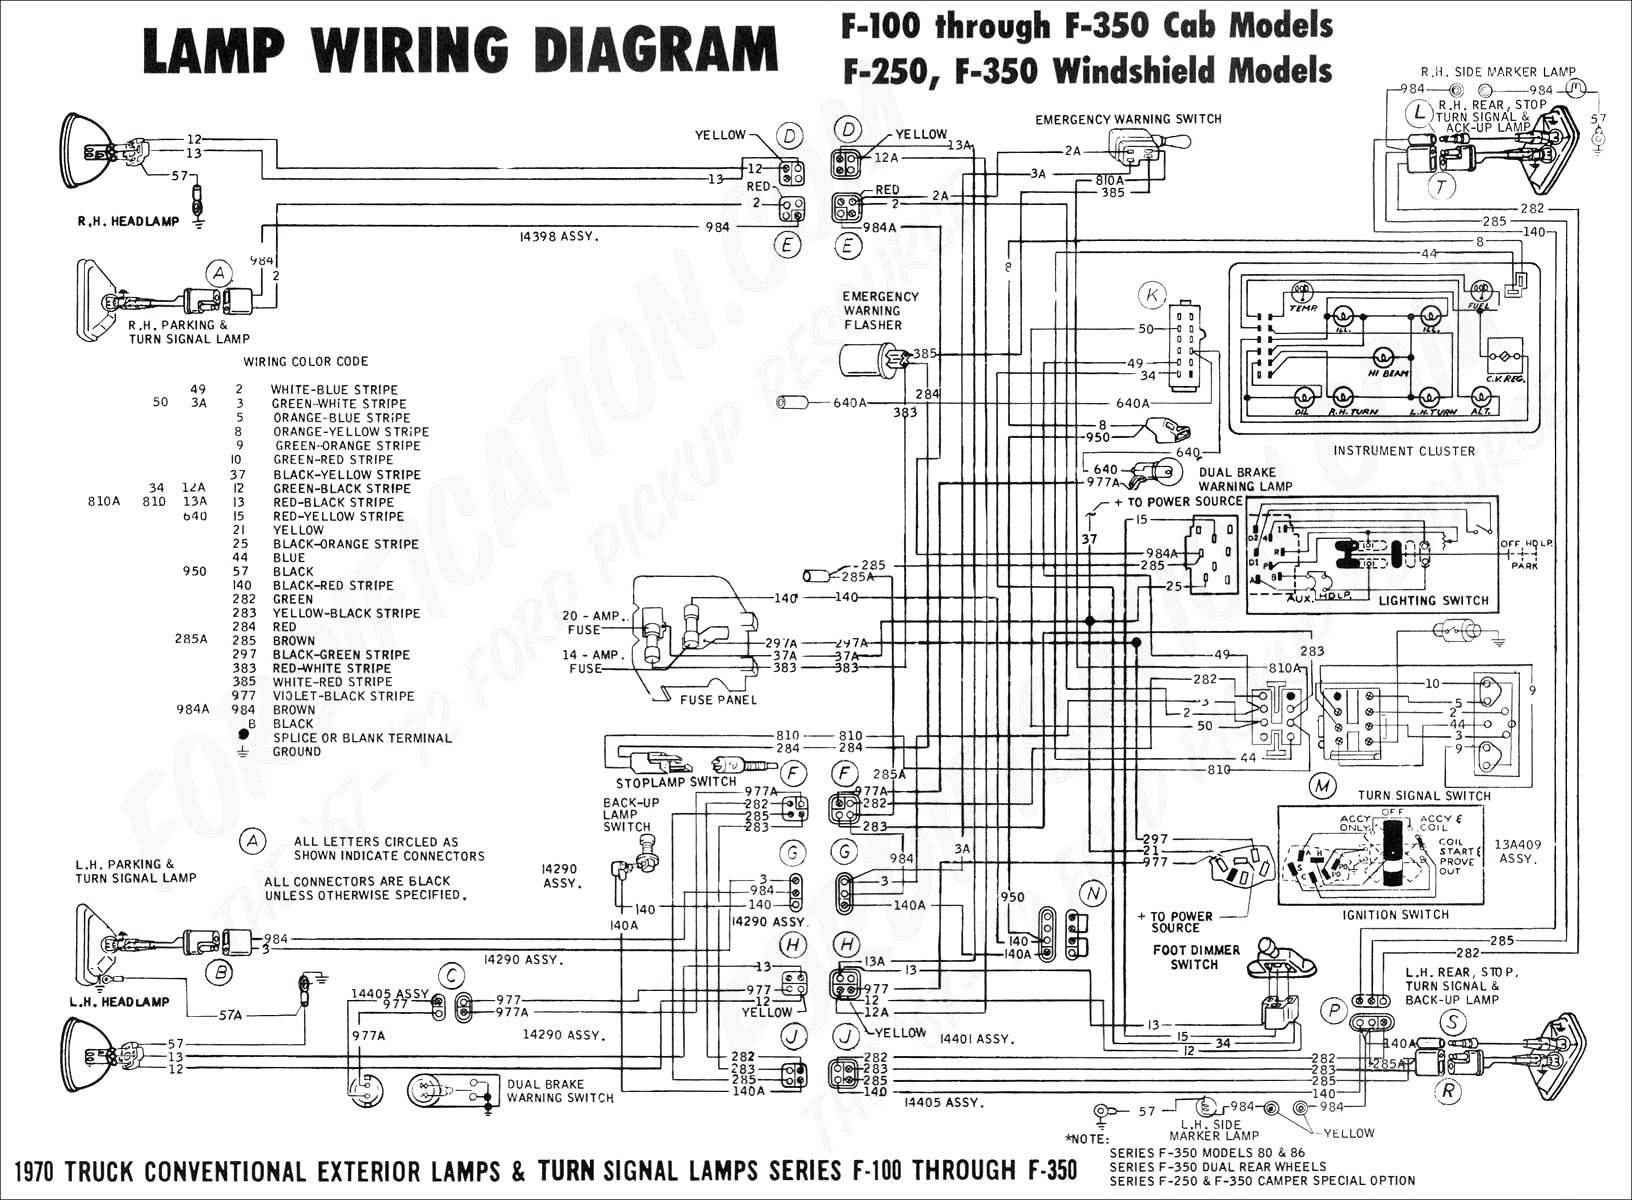 schaltplangviddyup electrical circuit symbols on parallel